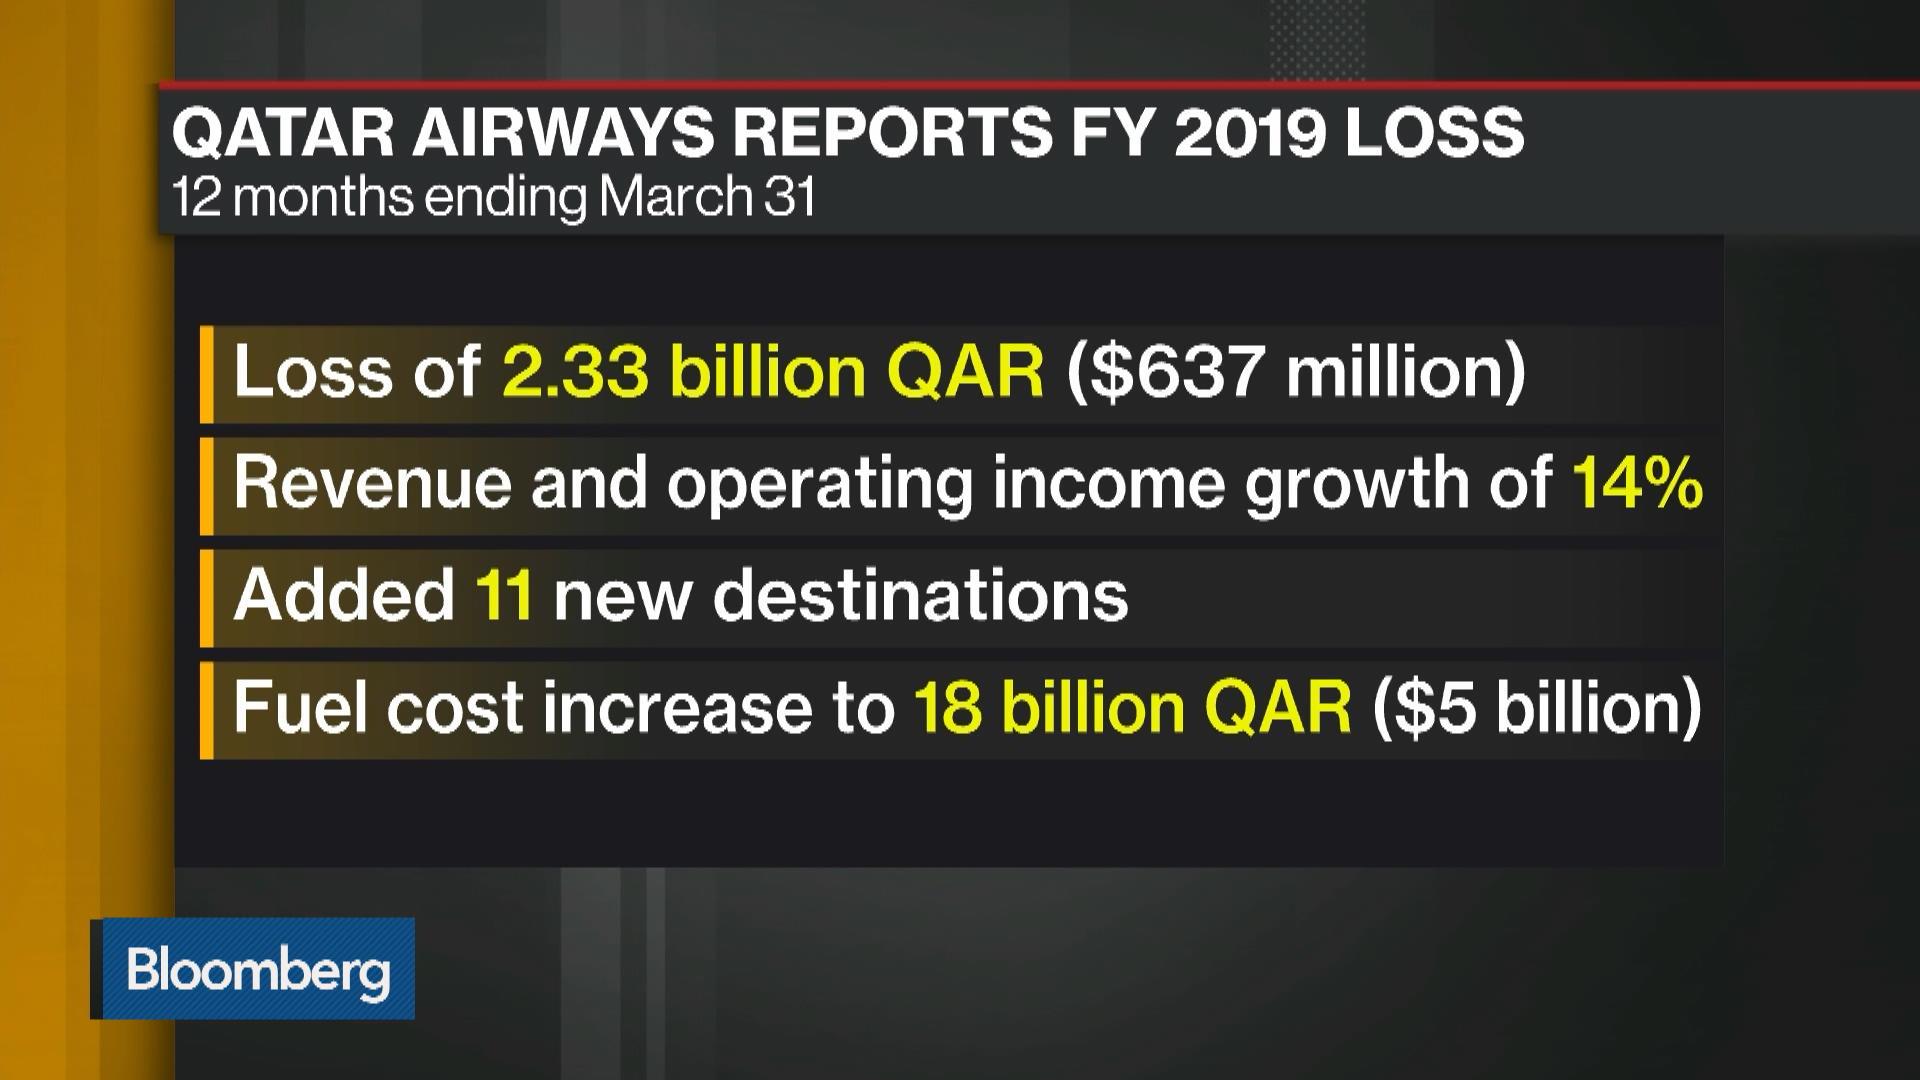 Qatar Airways Loss Widens on Higher Costs